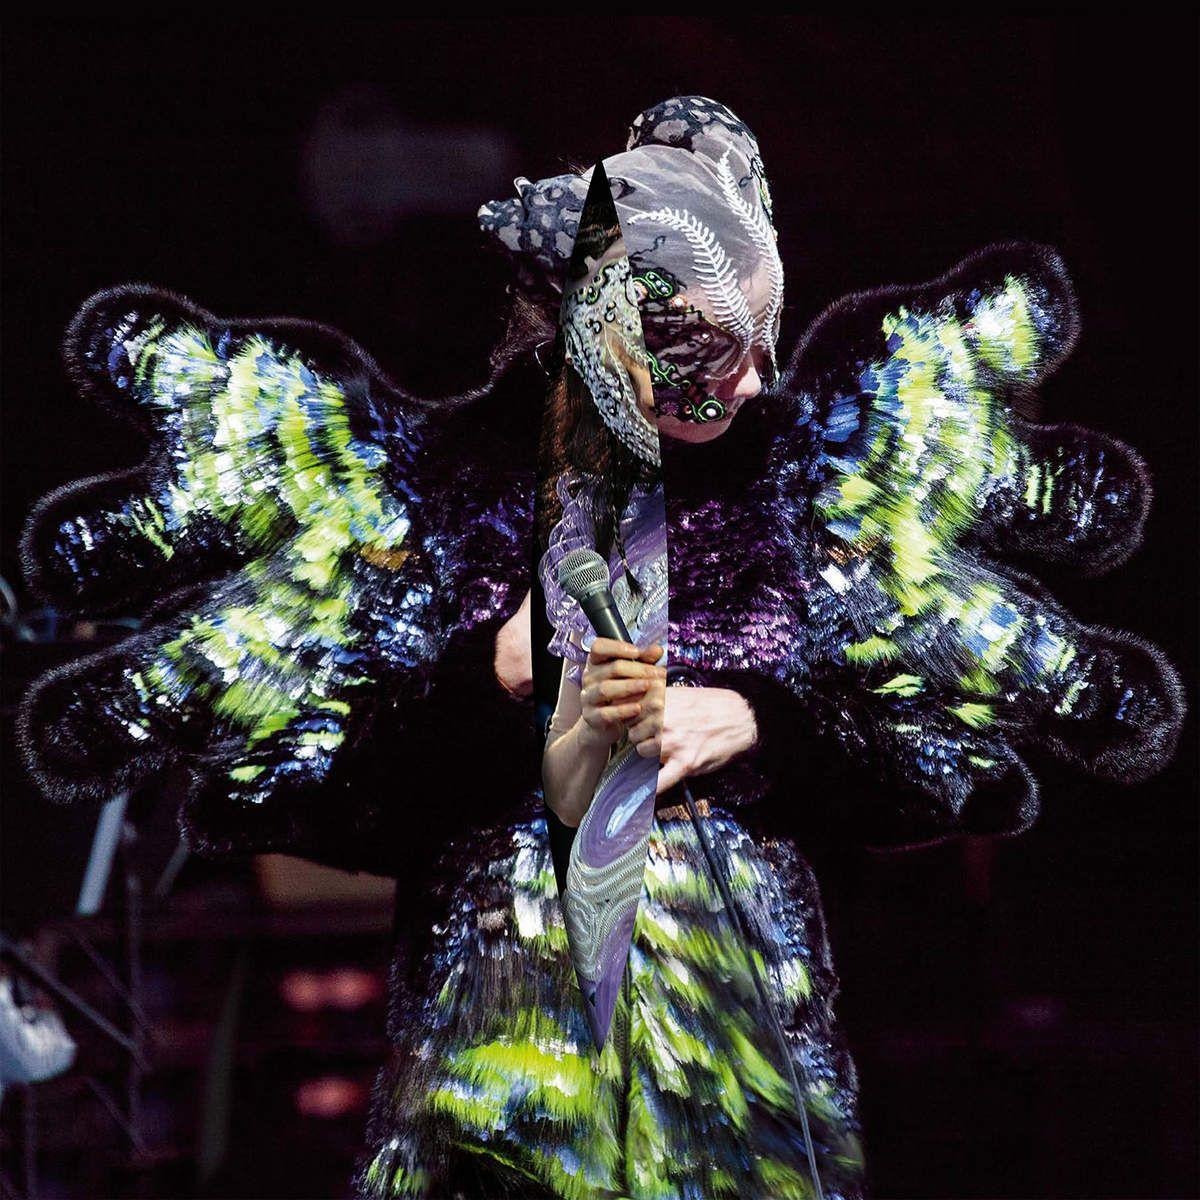 Björk - Vulnicura Live album cover